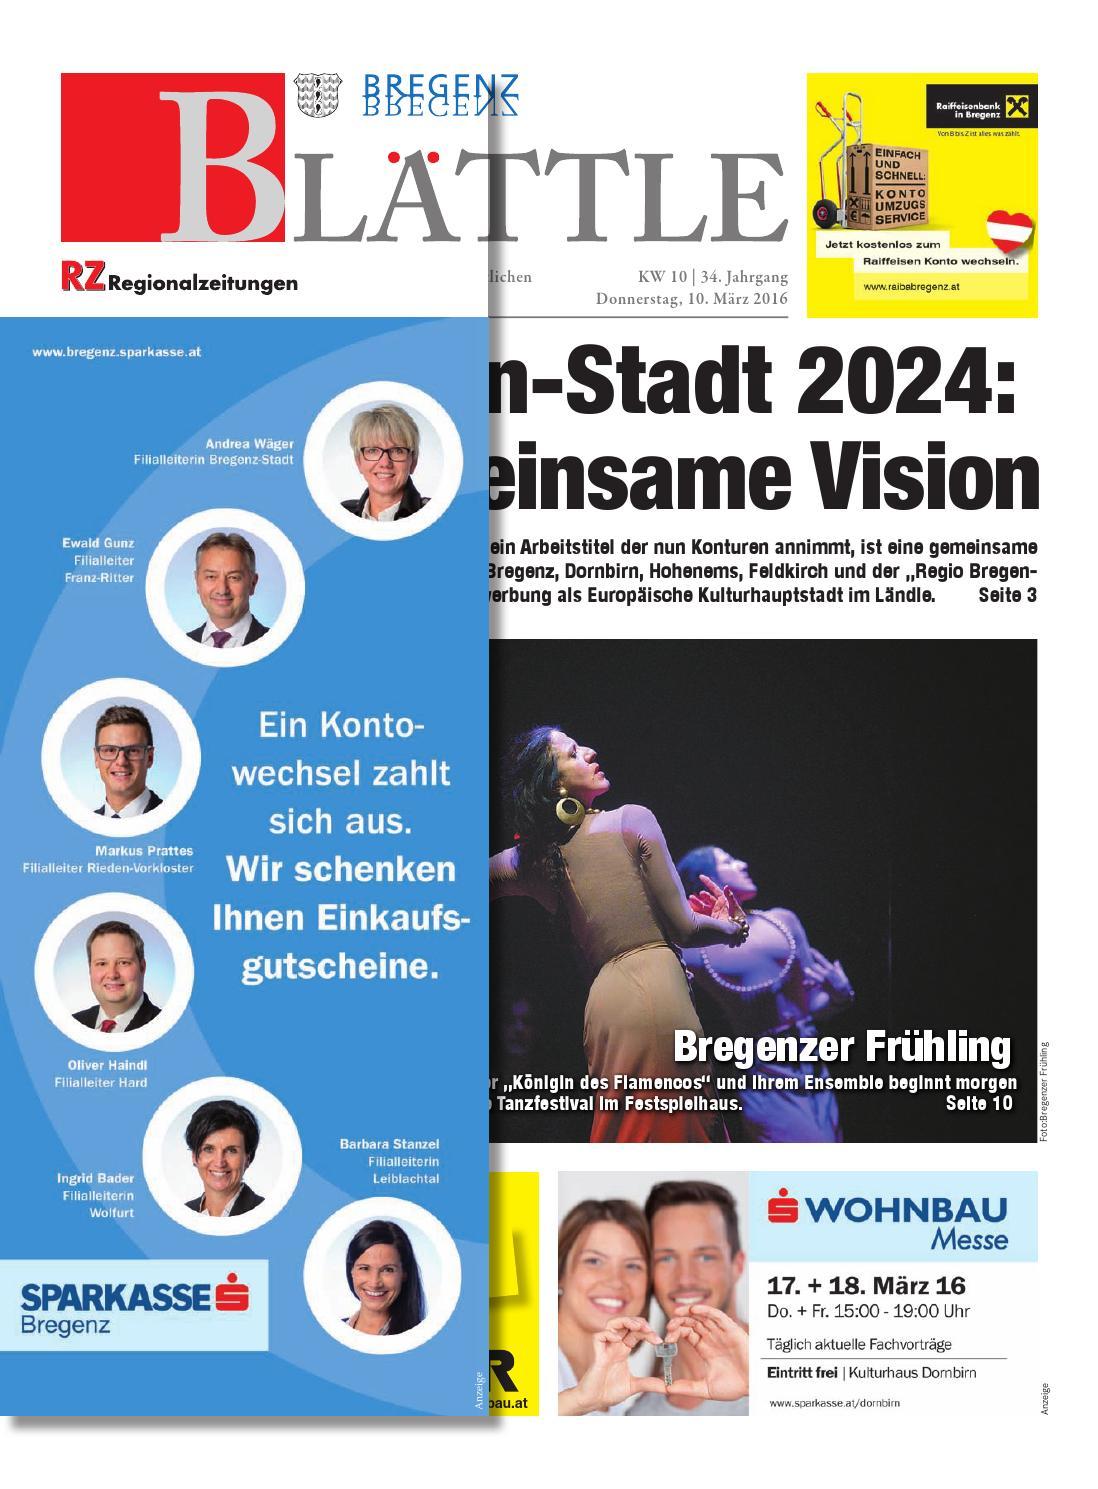 Partnerschaften & Kontakte in Bregenz - kostenlose